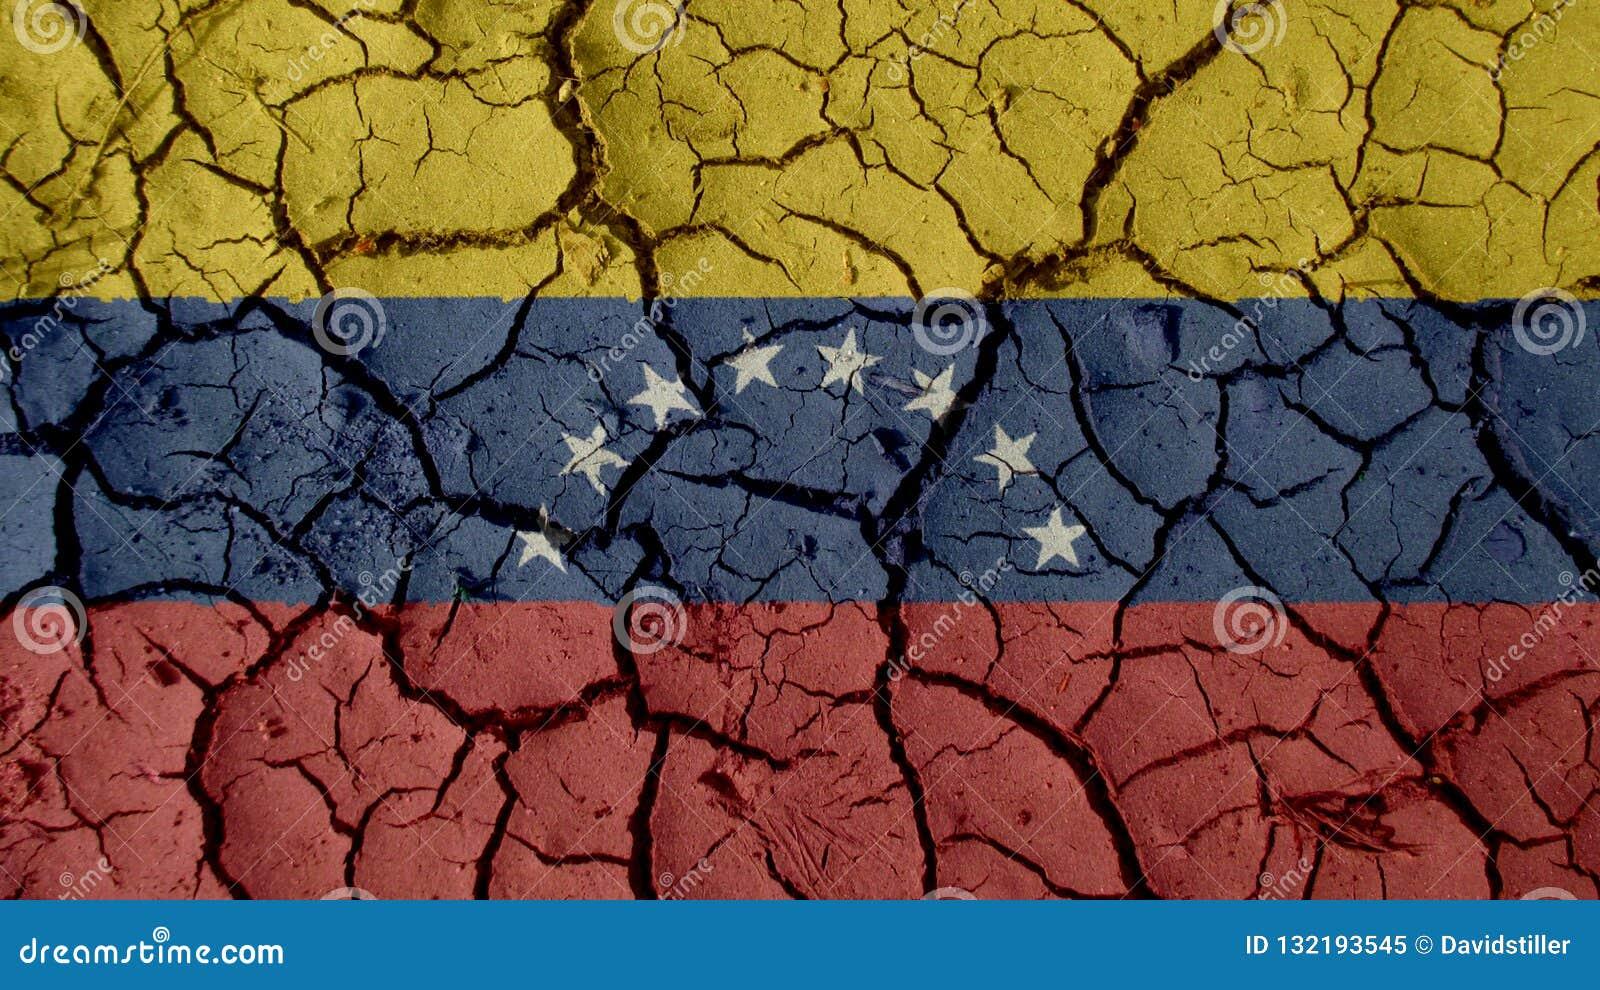 Crisis Concept: Mud Cracks With Venezuela Flag